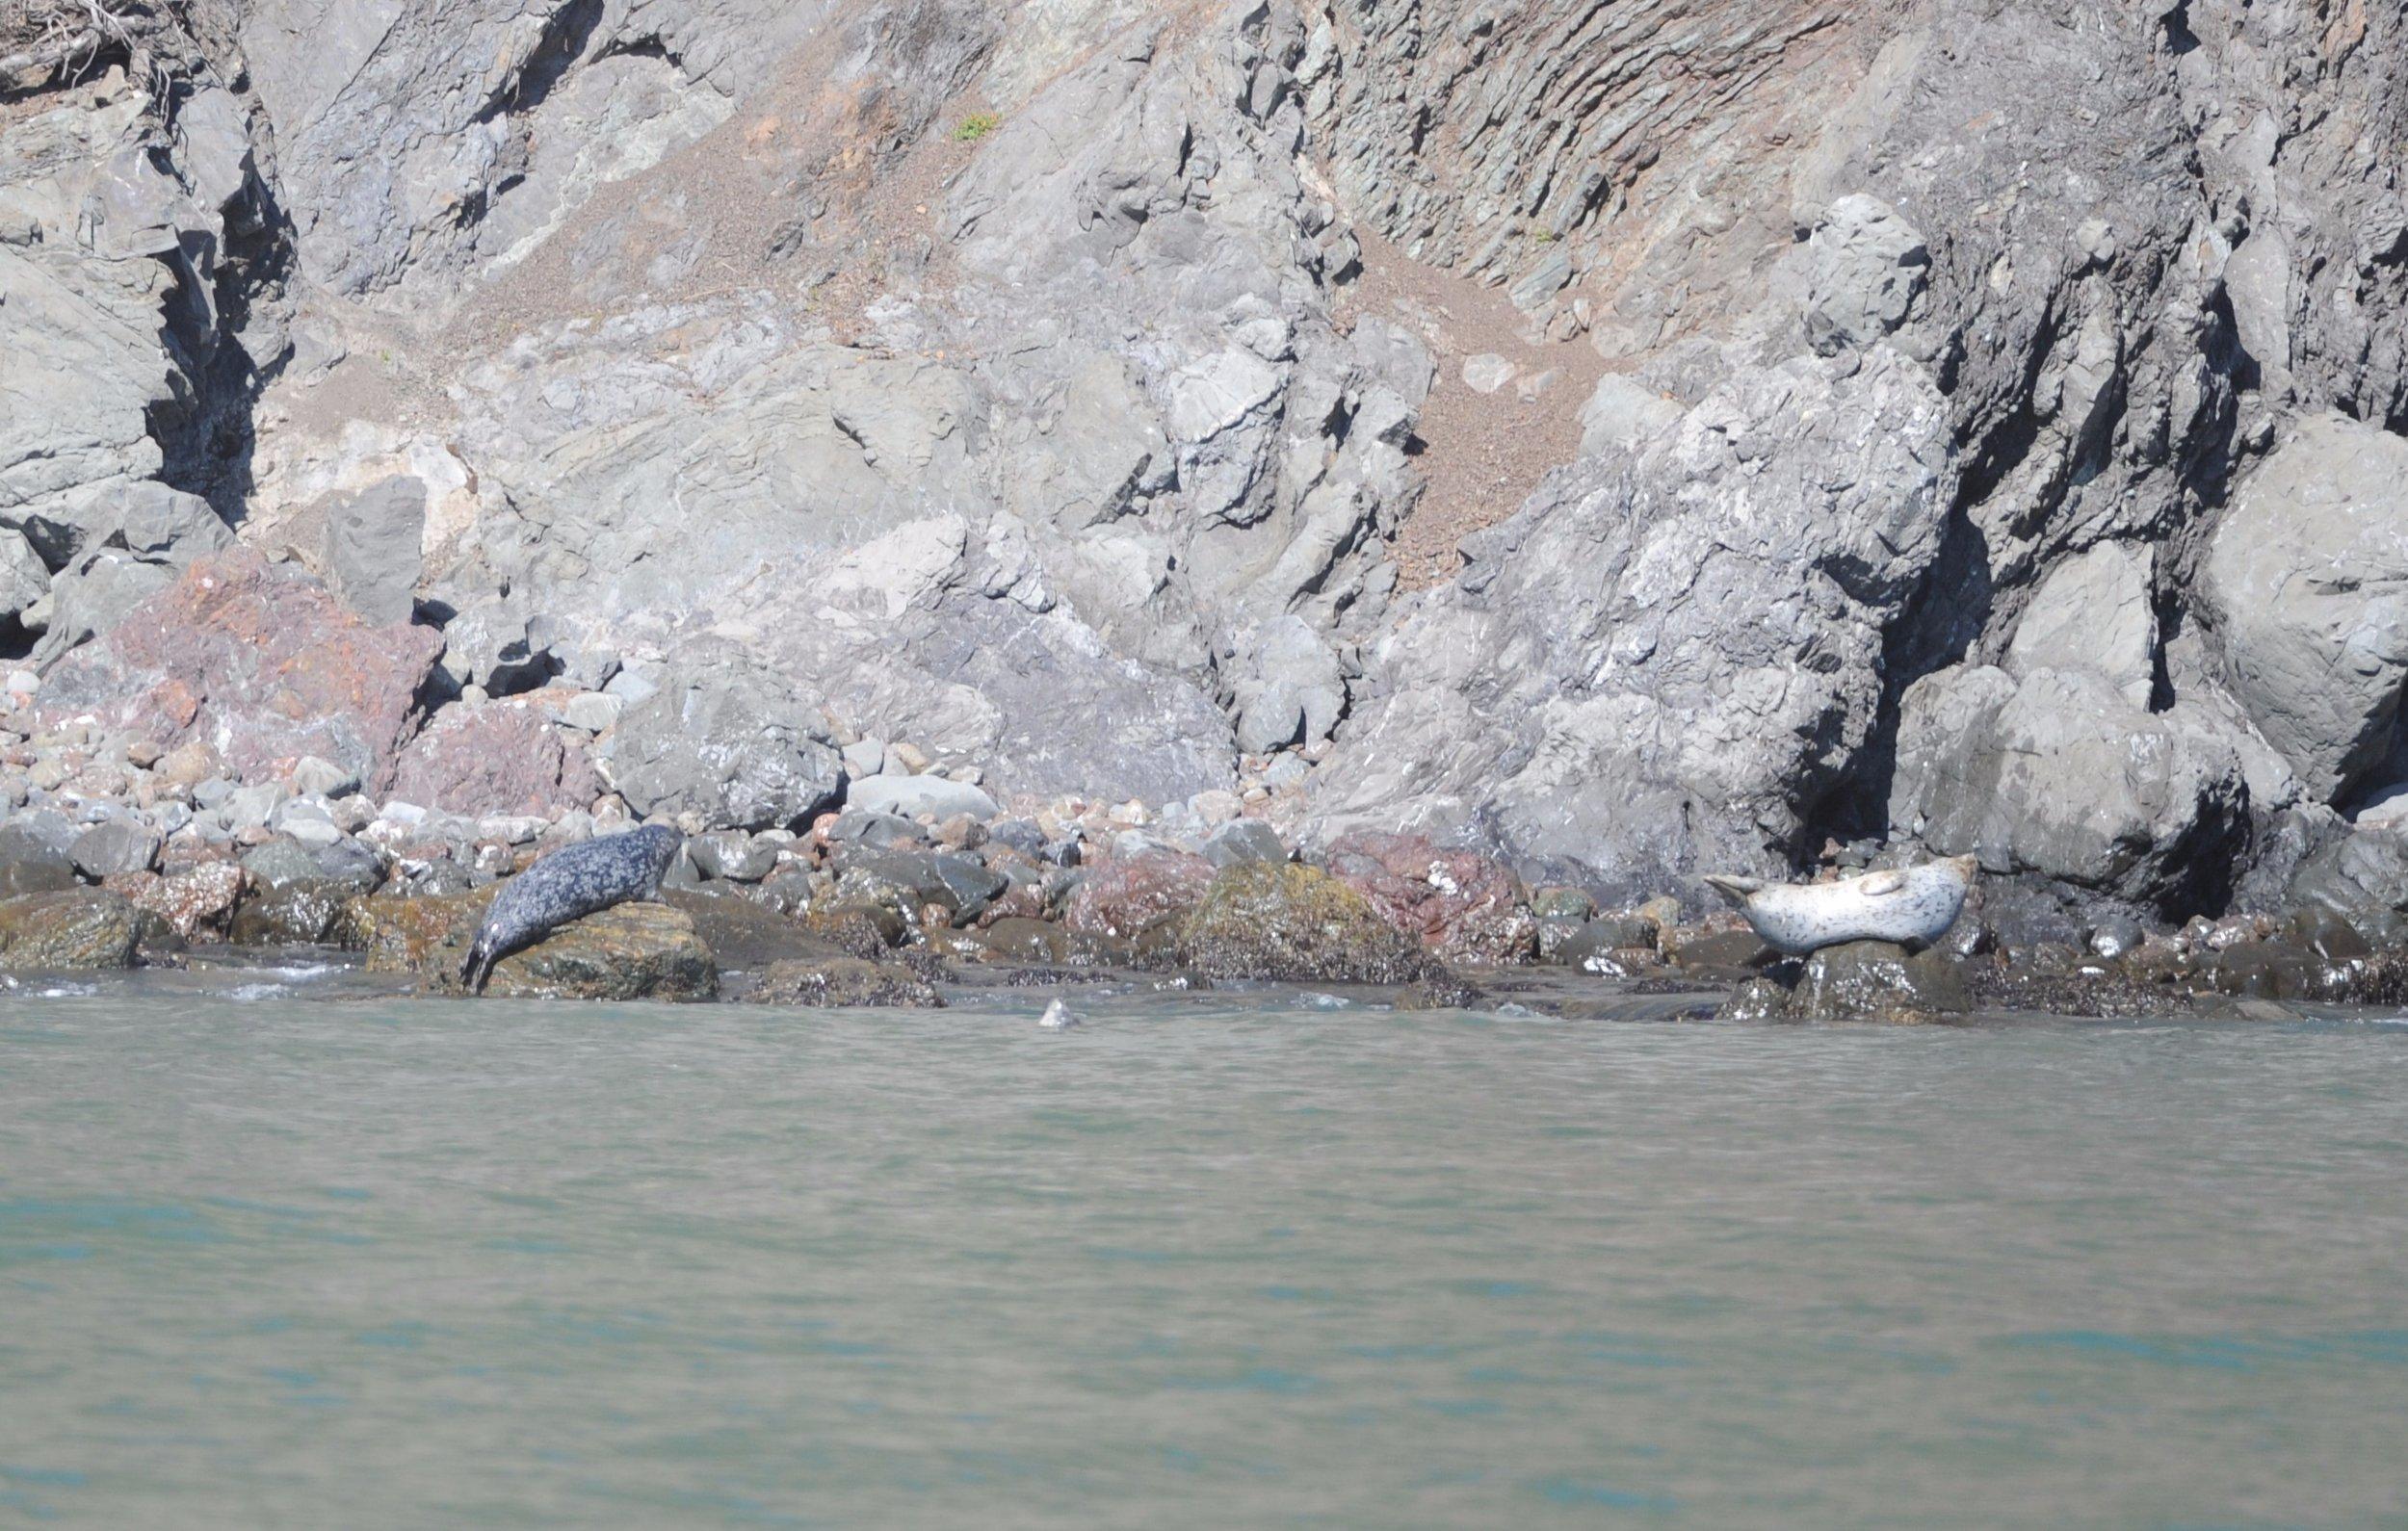 Harbor seals resting on the rocks in Diablo Cove.